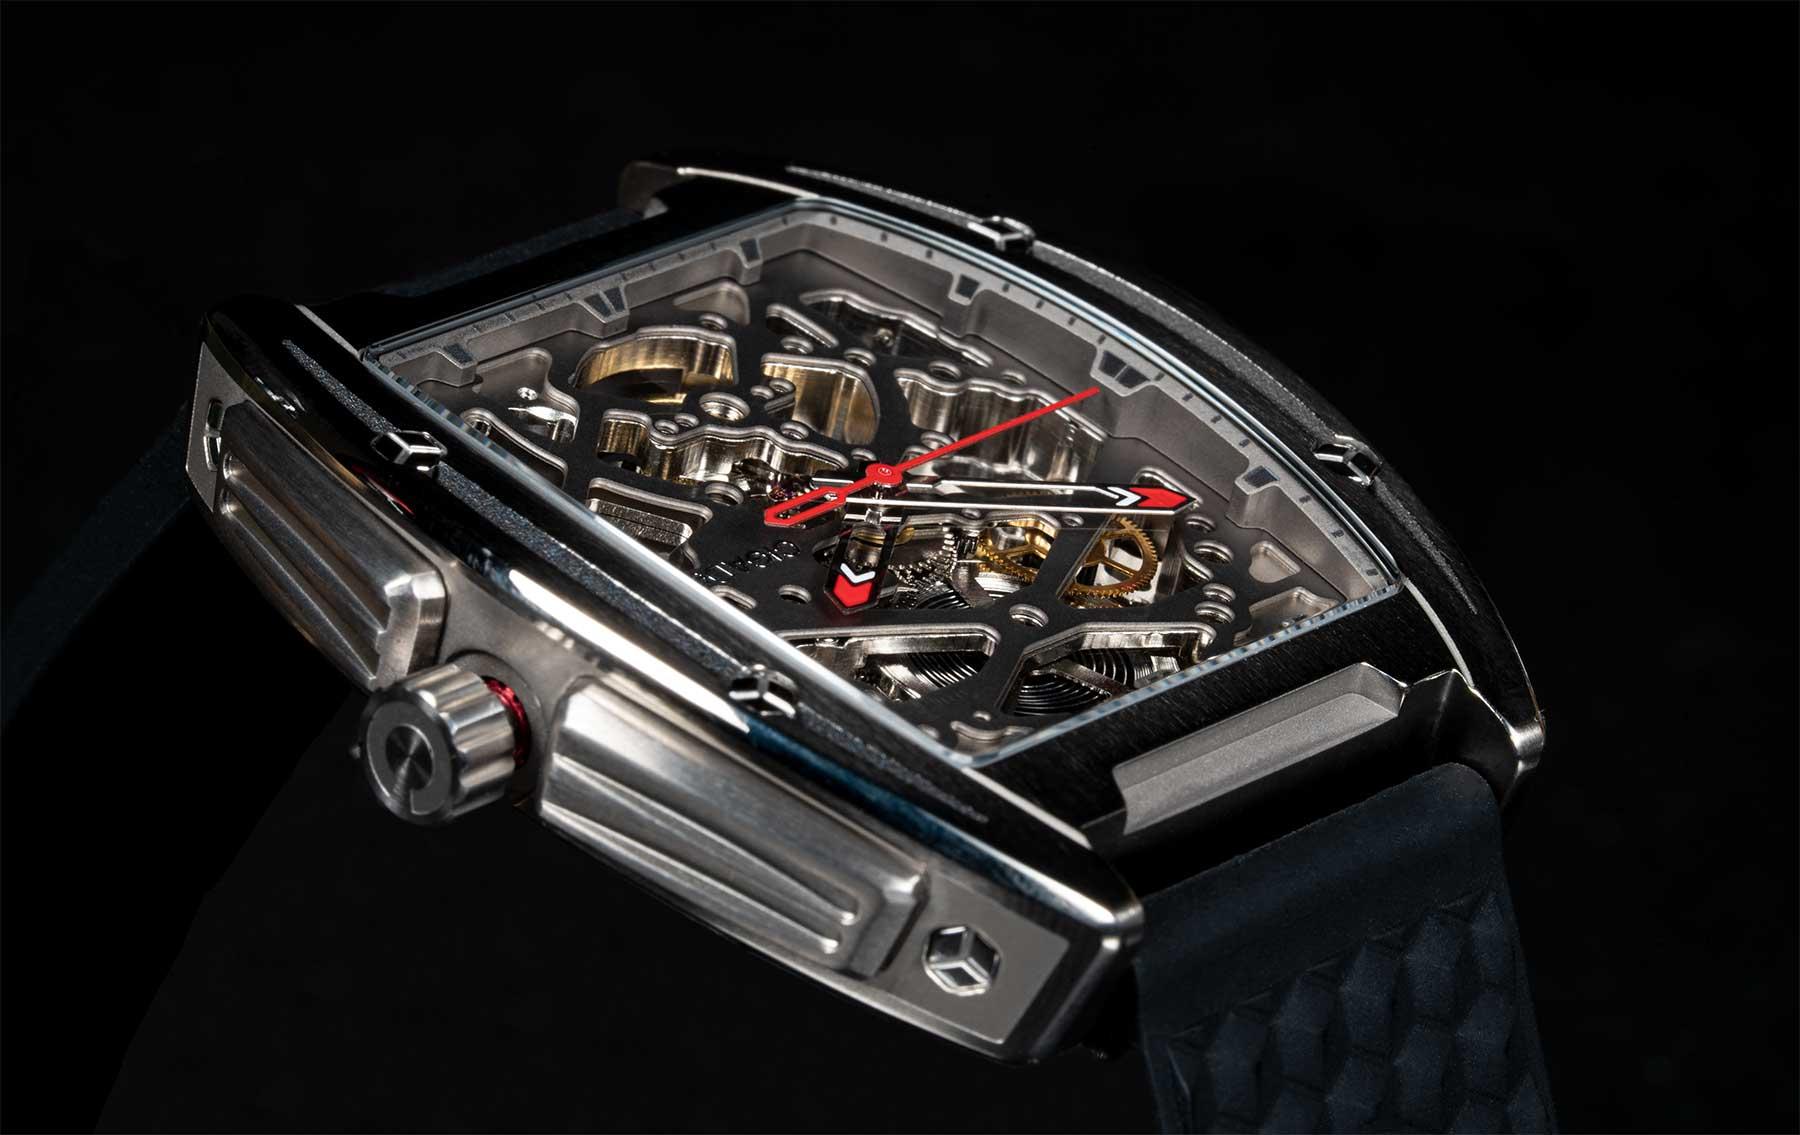 Starkes Design: CIGA Design Z-Series mechanische Titan-Armbanduhr